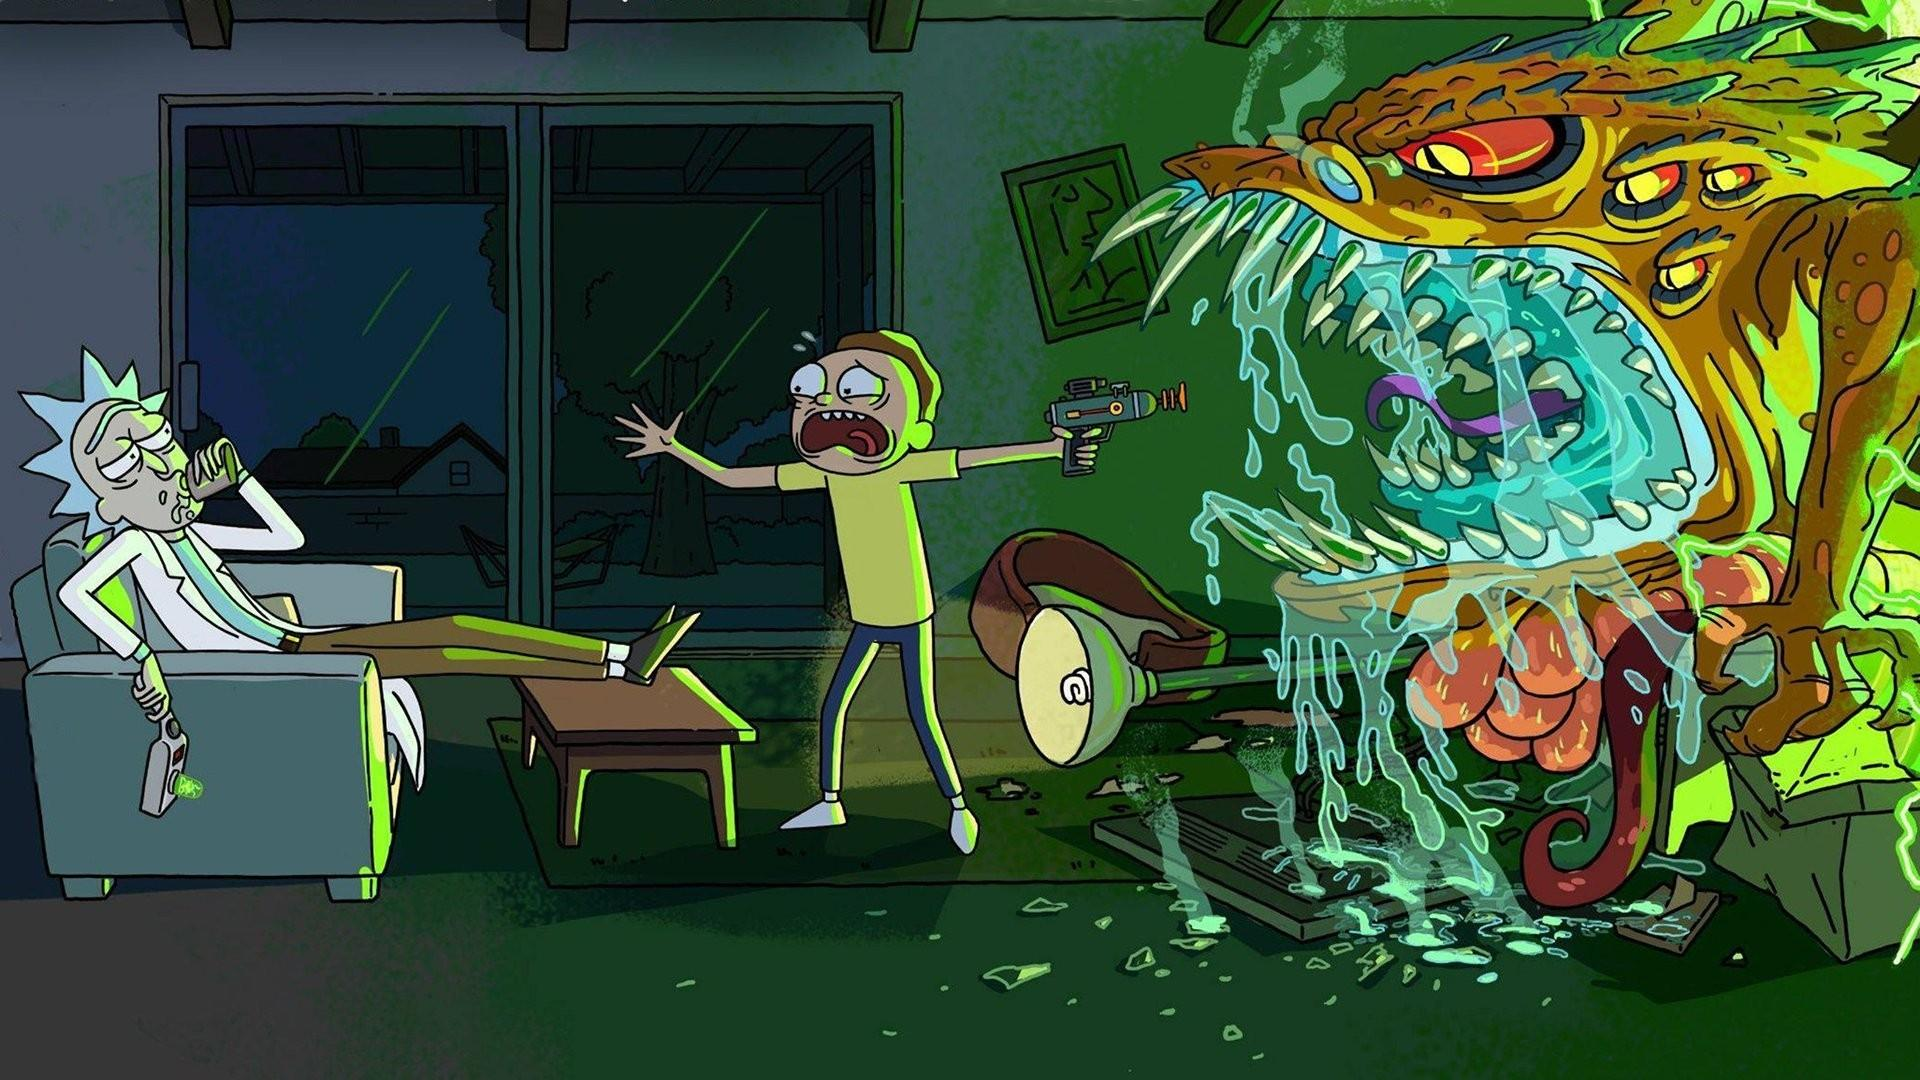 Desktop Rick And Morty Wallpapers - Wallpaper Cave